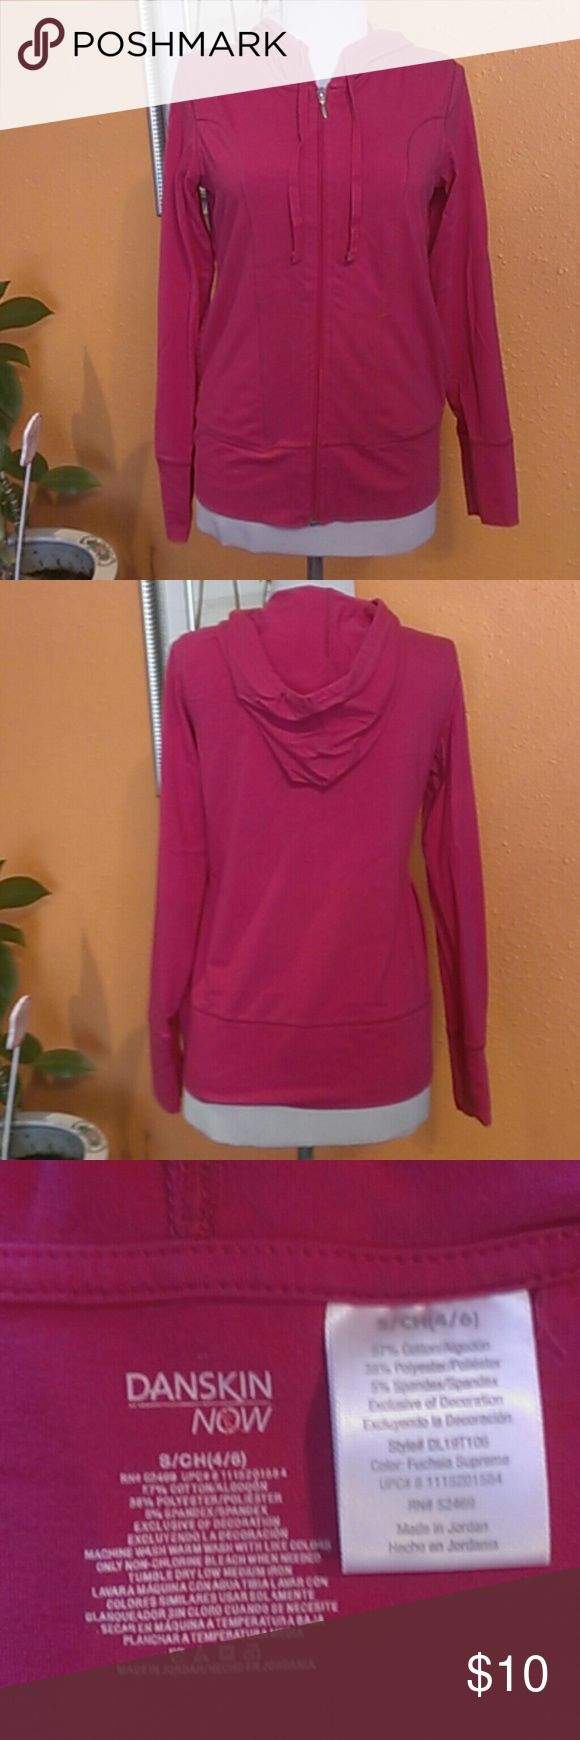 Sport Hoodie Jacket Danskin Sport Hoodie Jacket Danskin, 57%cotton, 38%polyester, 5%spandex, exclusive of decoration, color fiusha Danskin Jackets & Coats